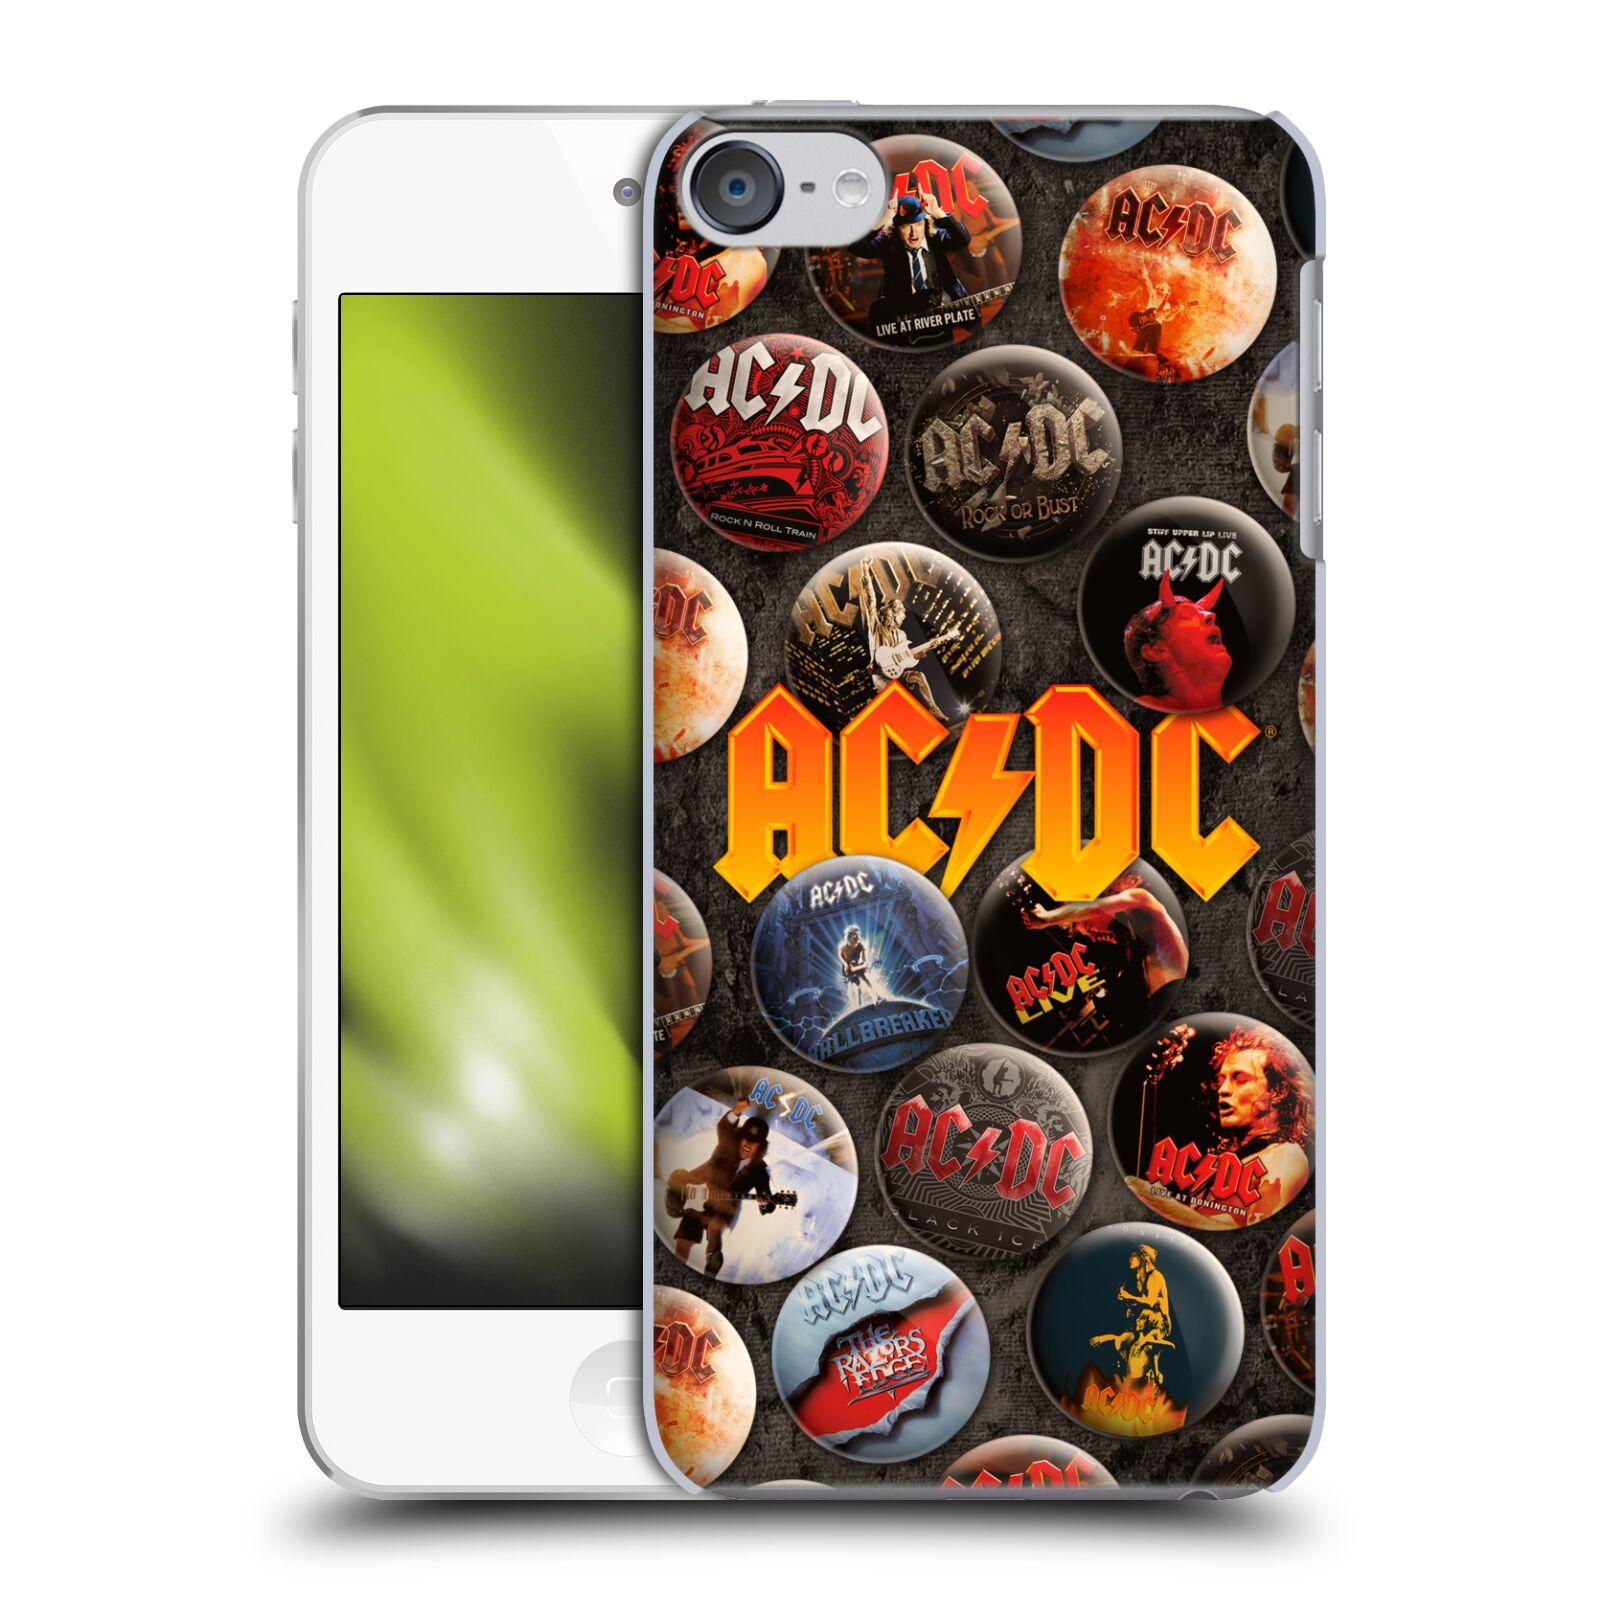 Oficial-de-AC-DC-ACDC-boton-Pines-Funda-Rigida-Posterior-Para-Apple-iPod-Touch-MP3